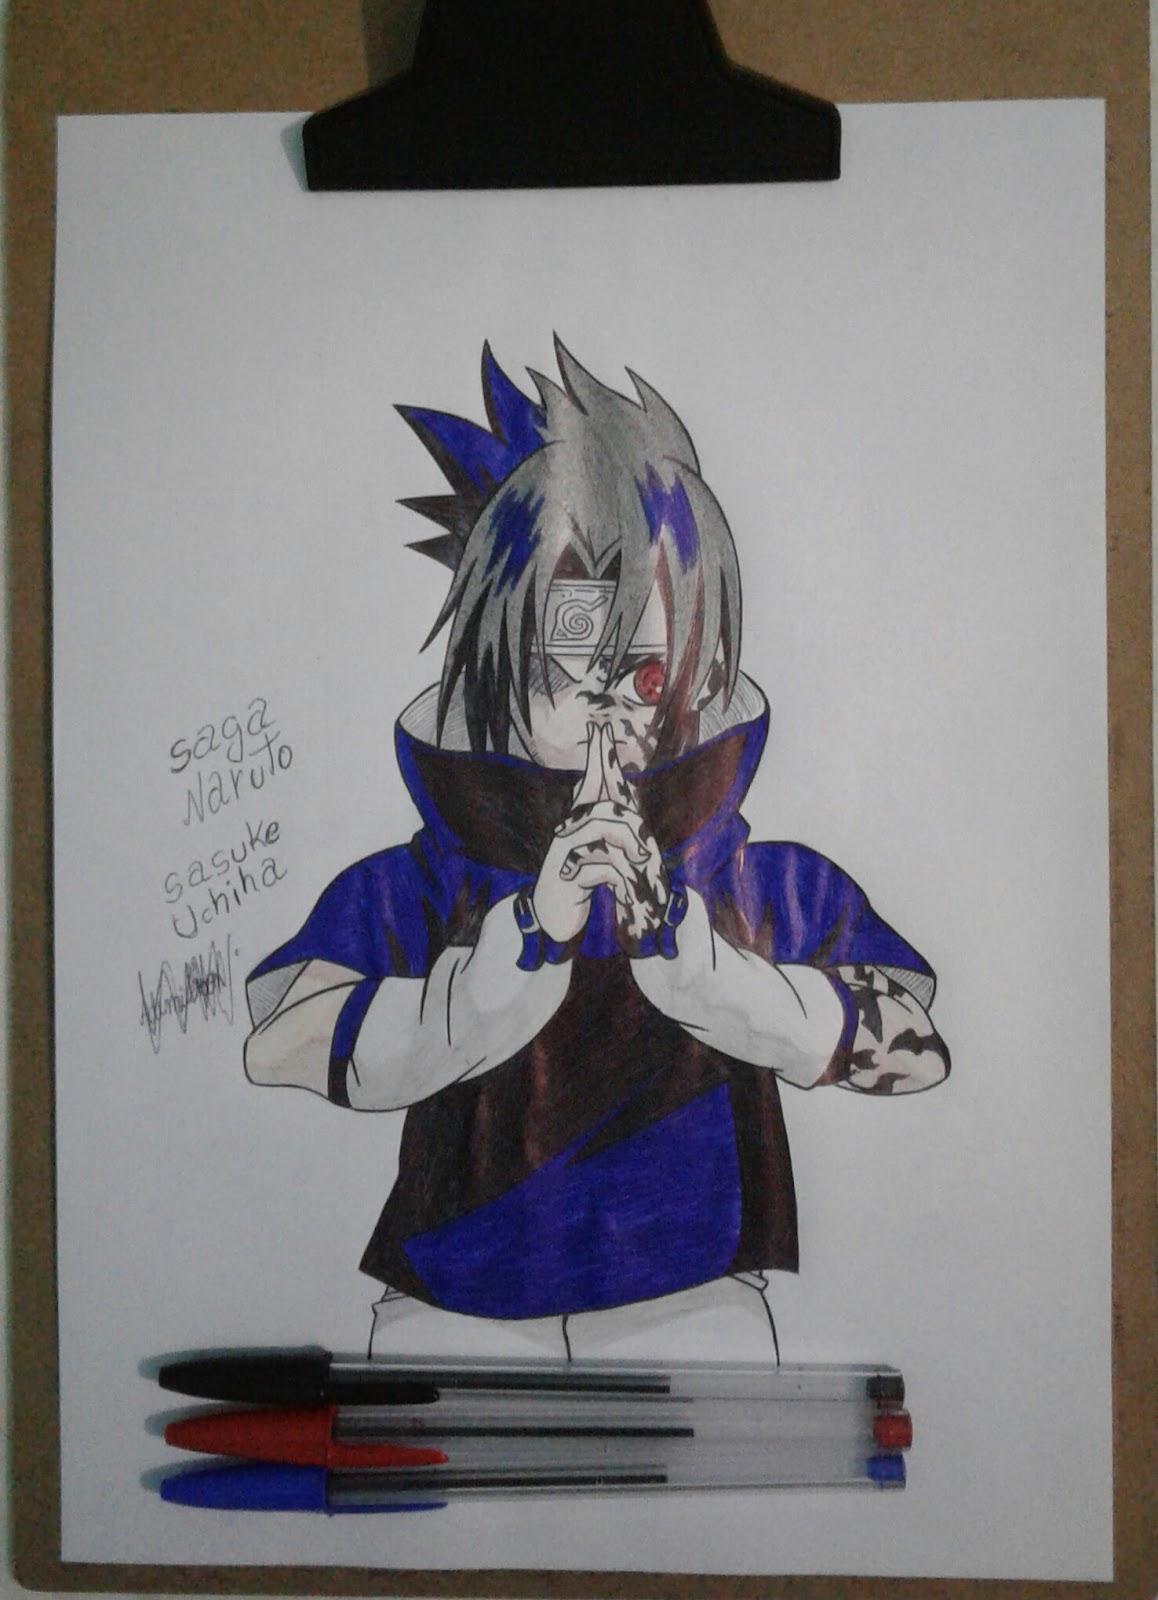 Arte Kawaii Brasil Desenho Do Sasuke Uchiha